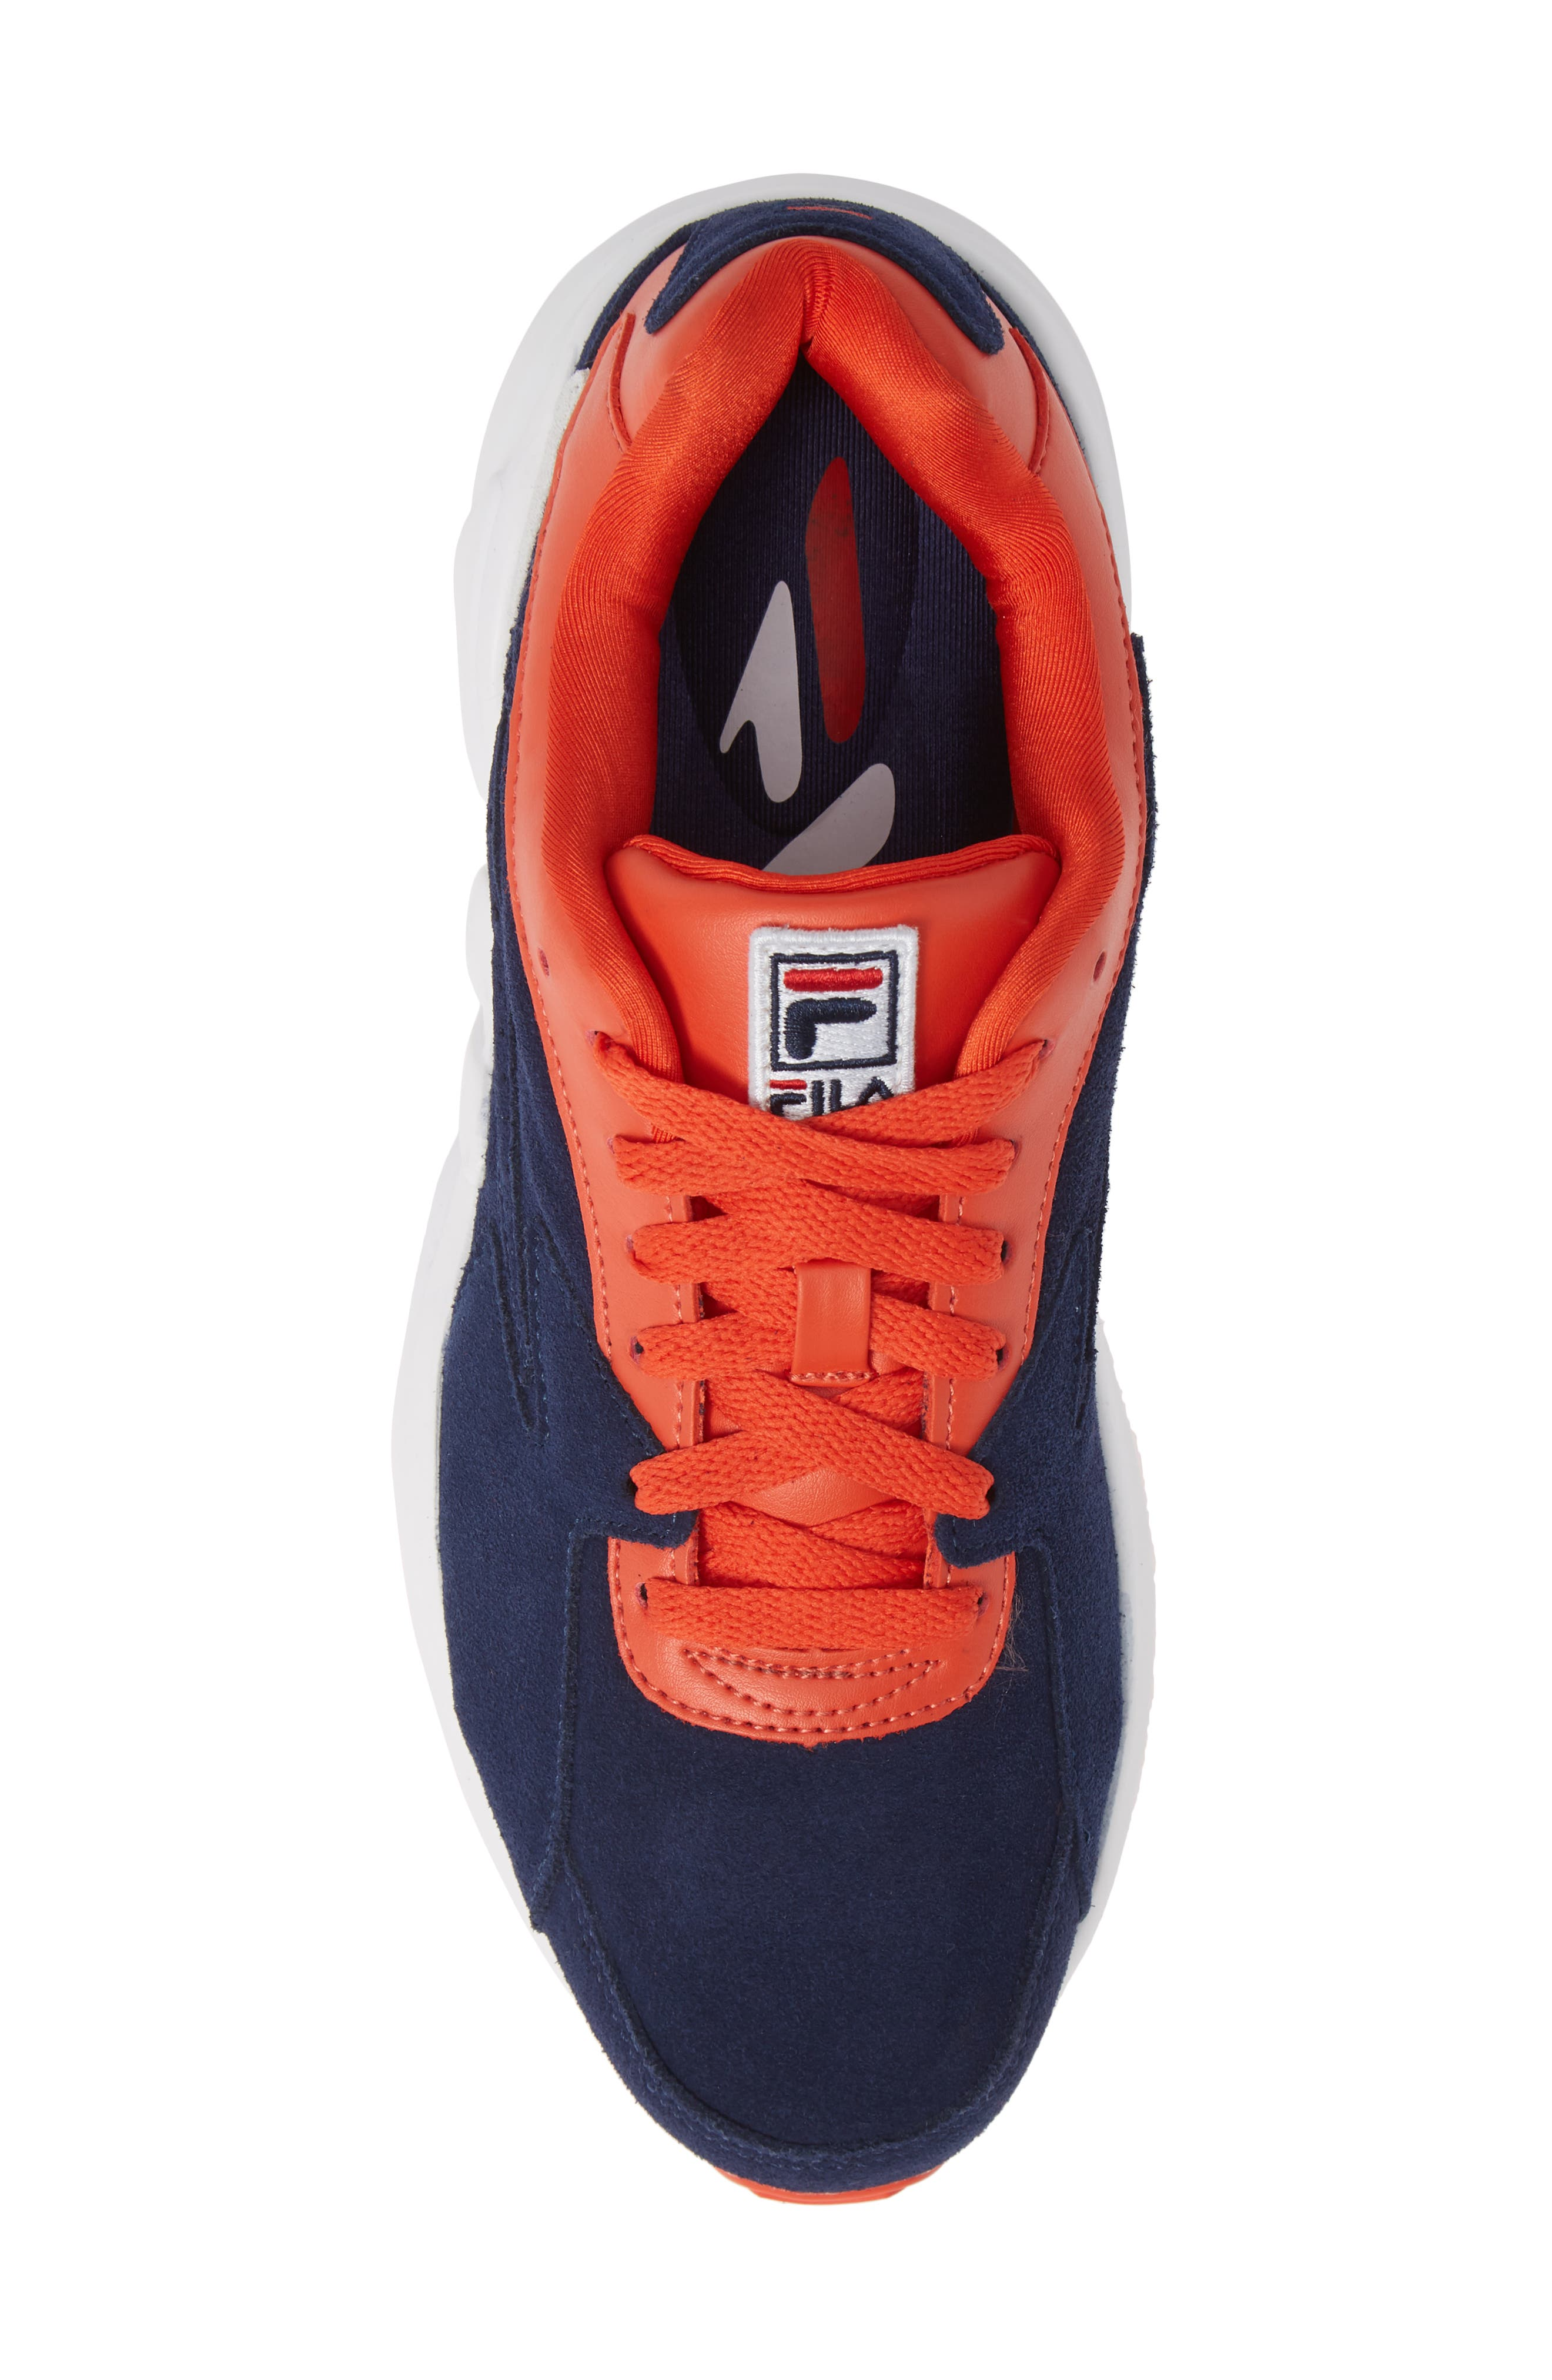 Mindblower Sneaker,                             Alternate thumbnail 5, color,                             NAVY/ WHITE/ RED